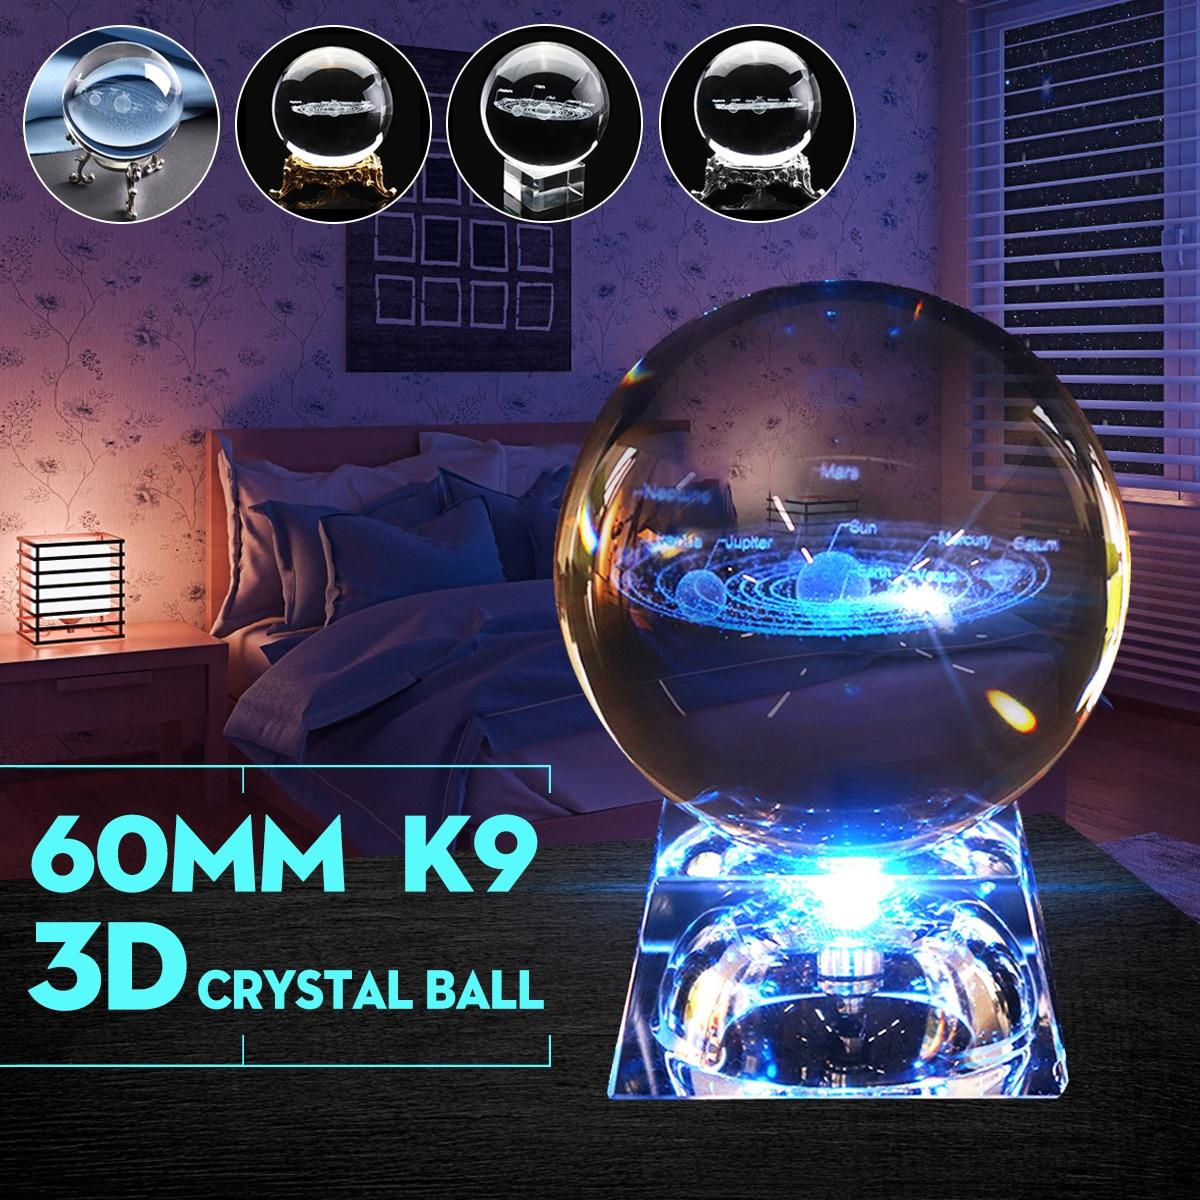 60MM Diameter 3D Crystal Ball Solar System Model  Home Decoration Accessories Gift 3D Laser Engraved Quartz Glass Ball